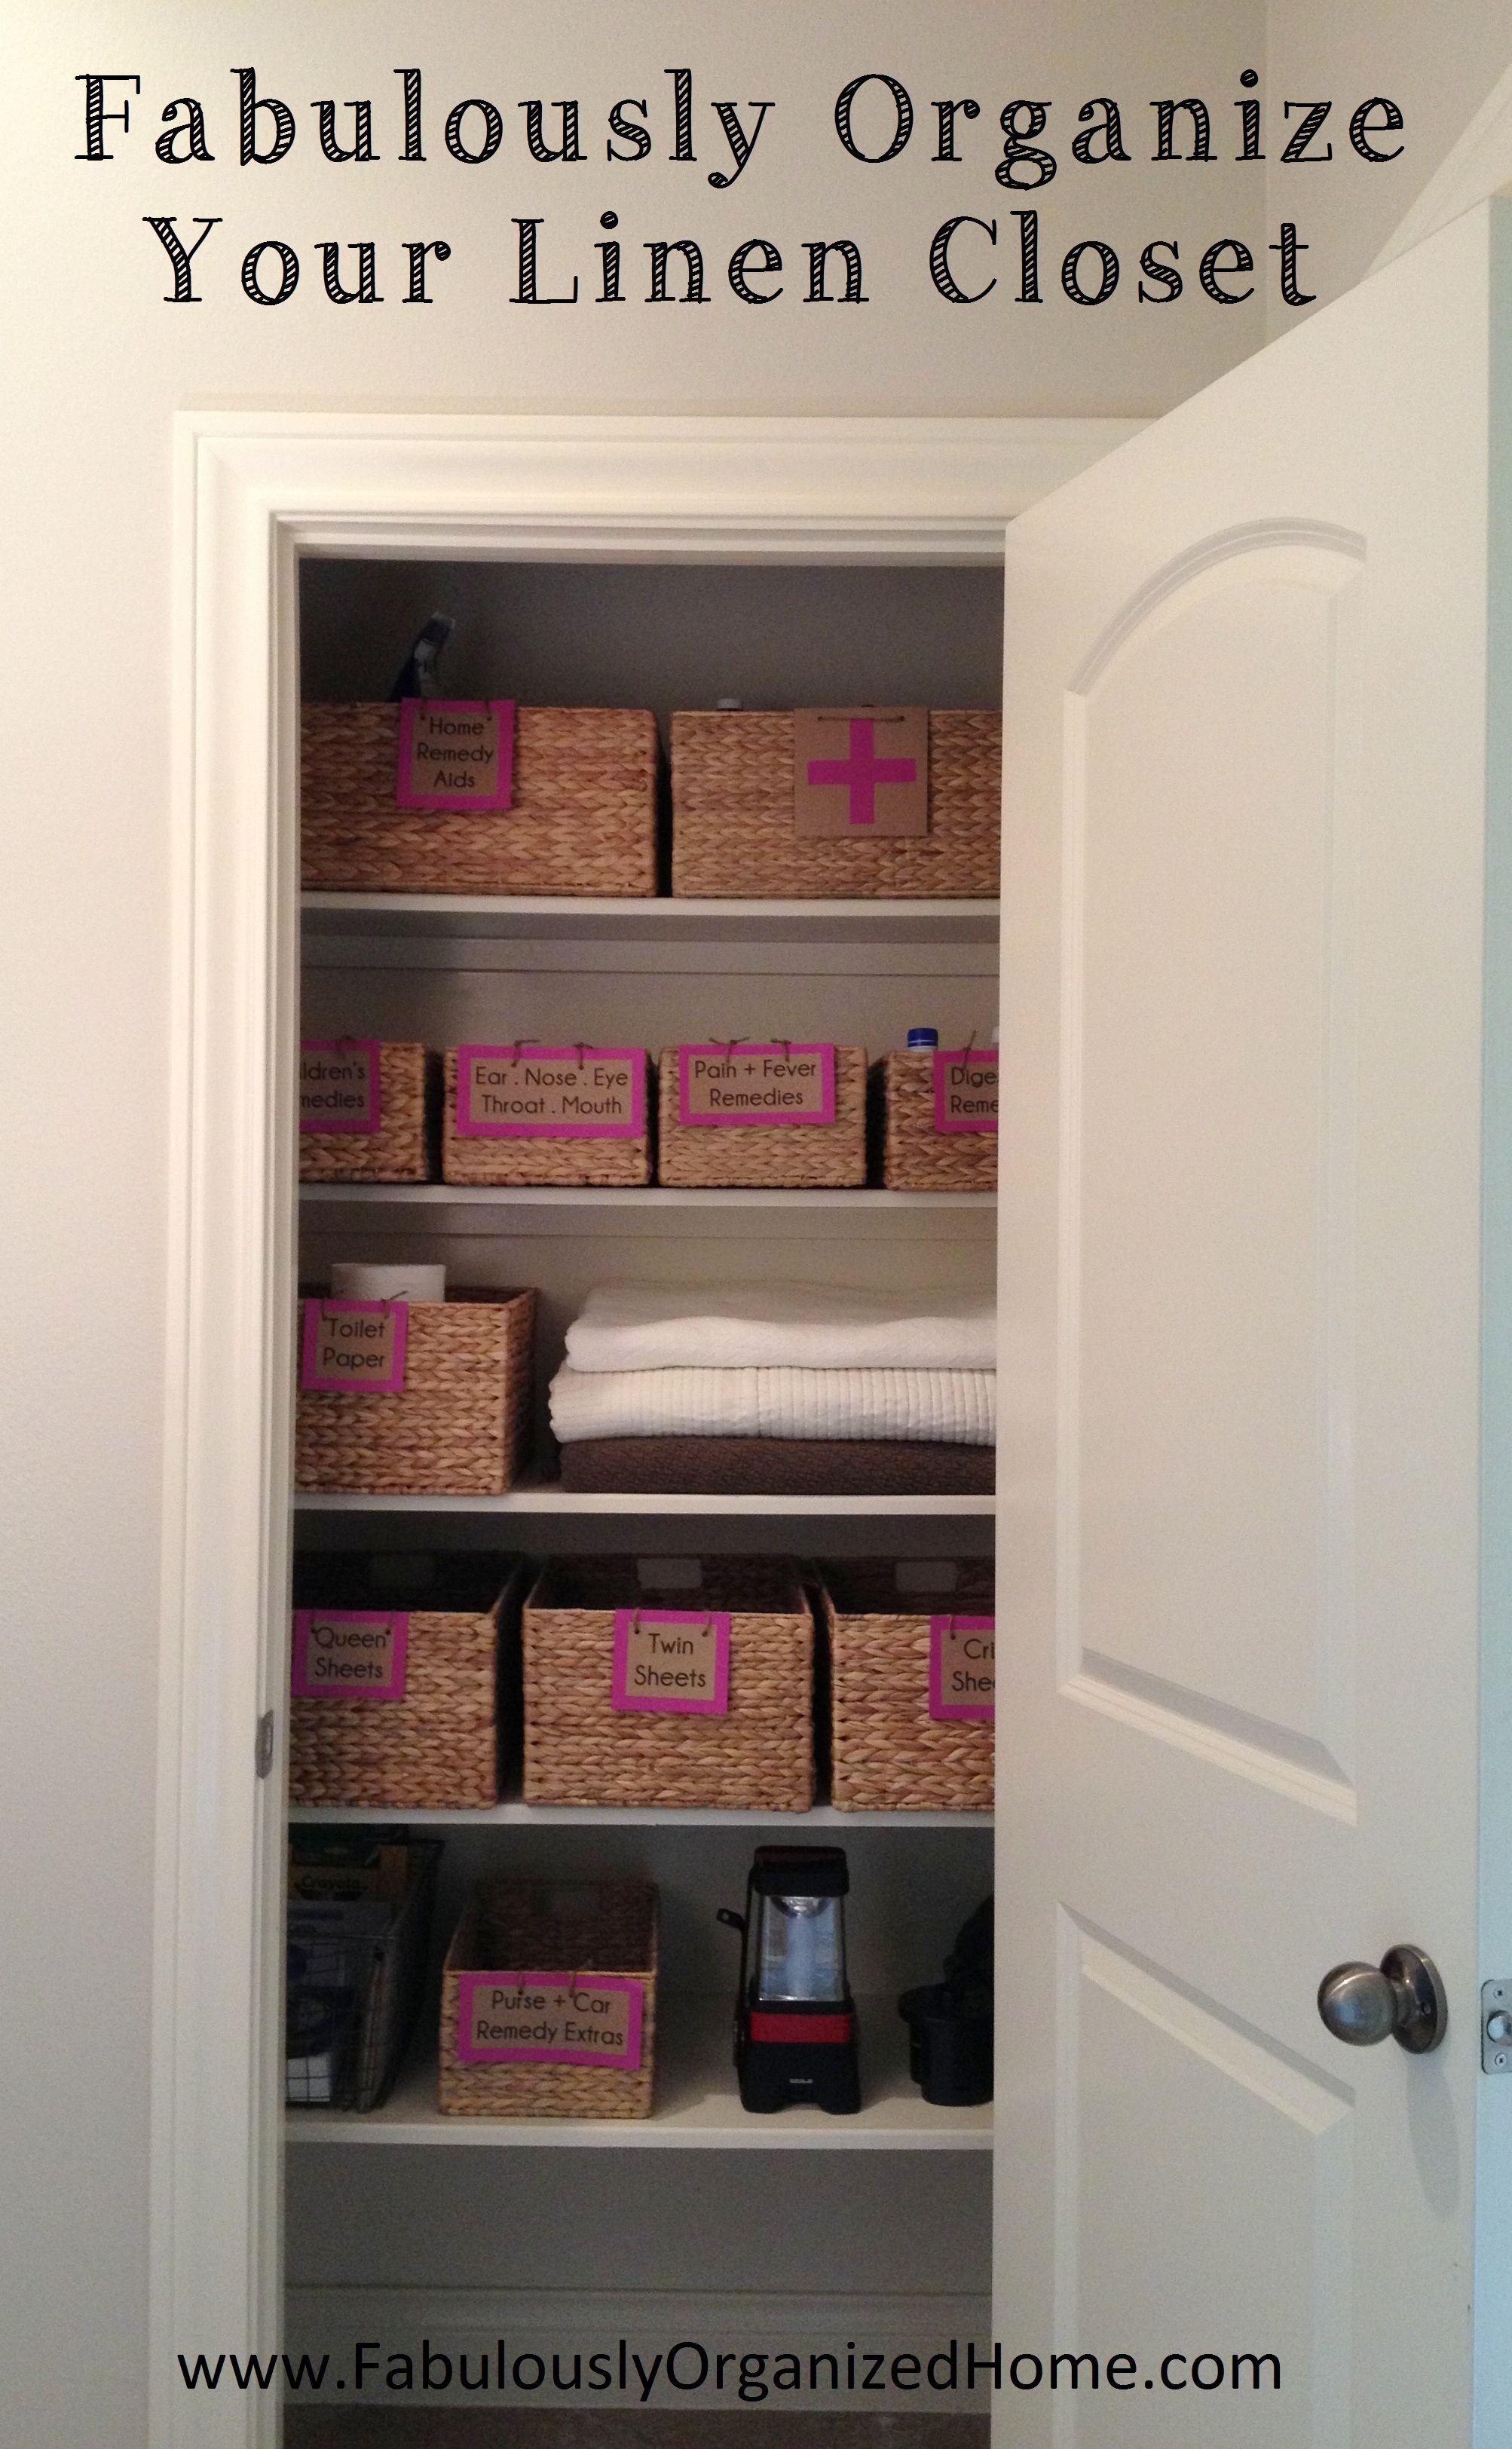 ORGANIZE YOUR LINEN CLOSET | Fabulously Organized Home